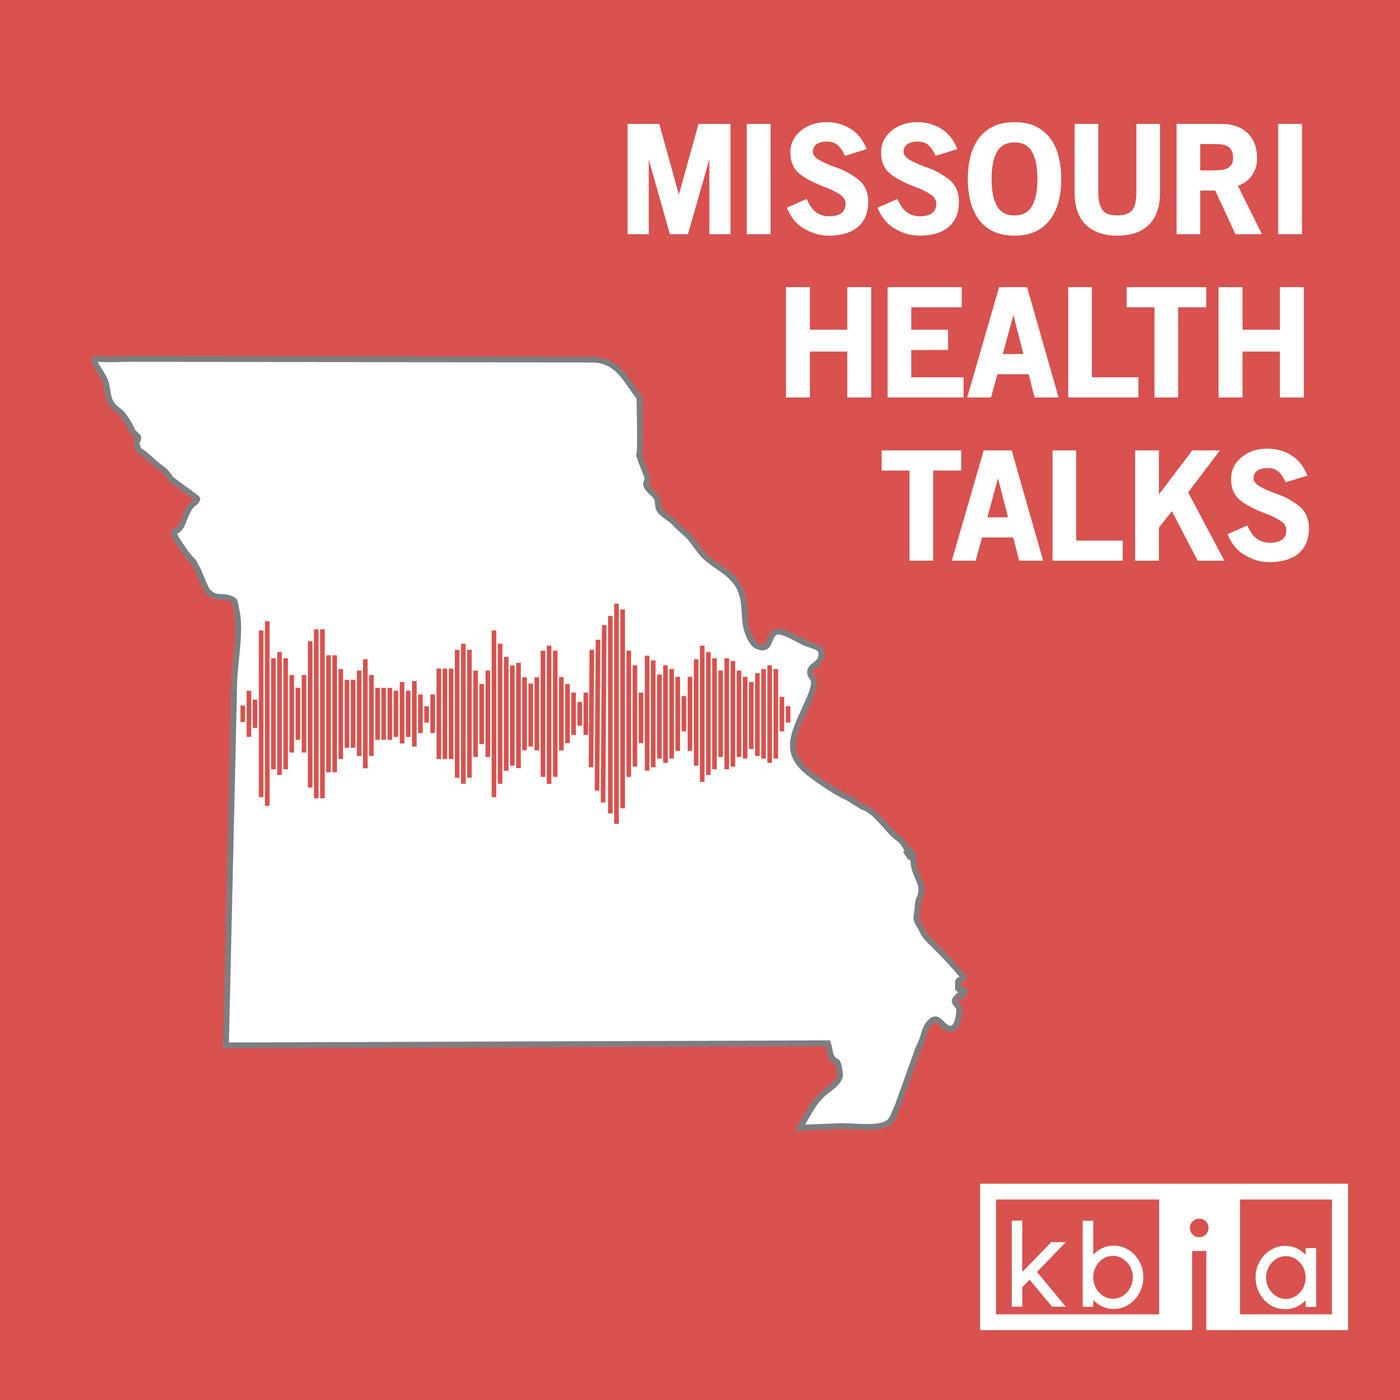 Missouri health talks kbia solutioingenieria Choice Image